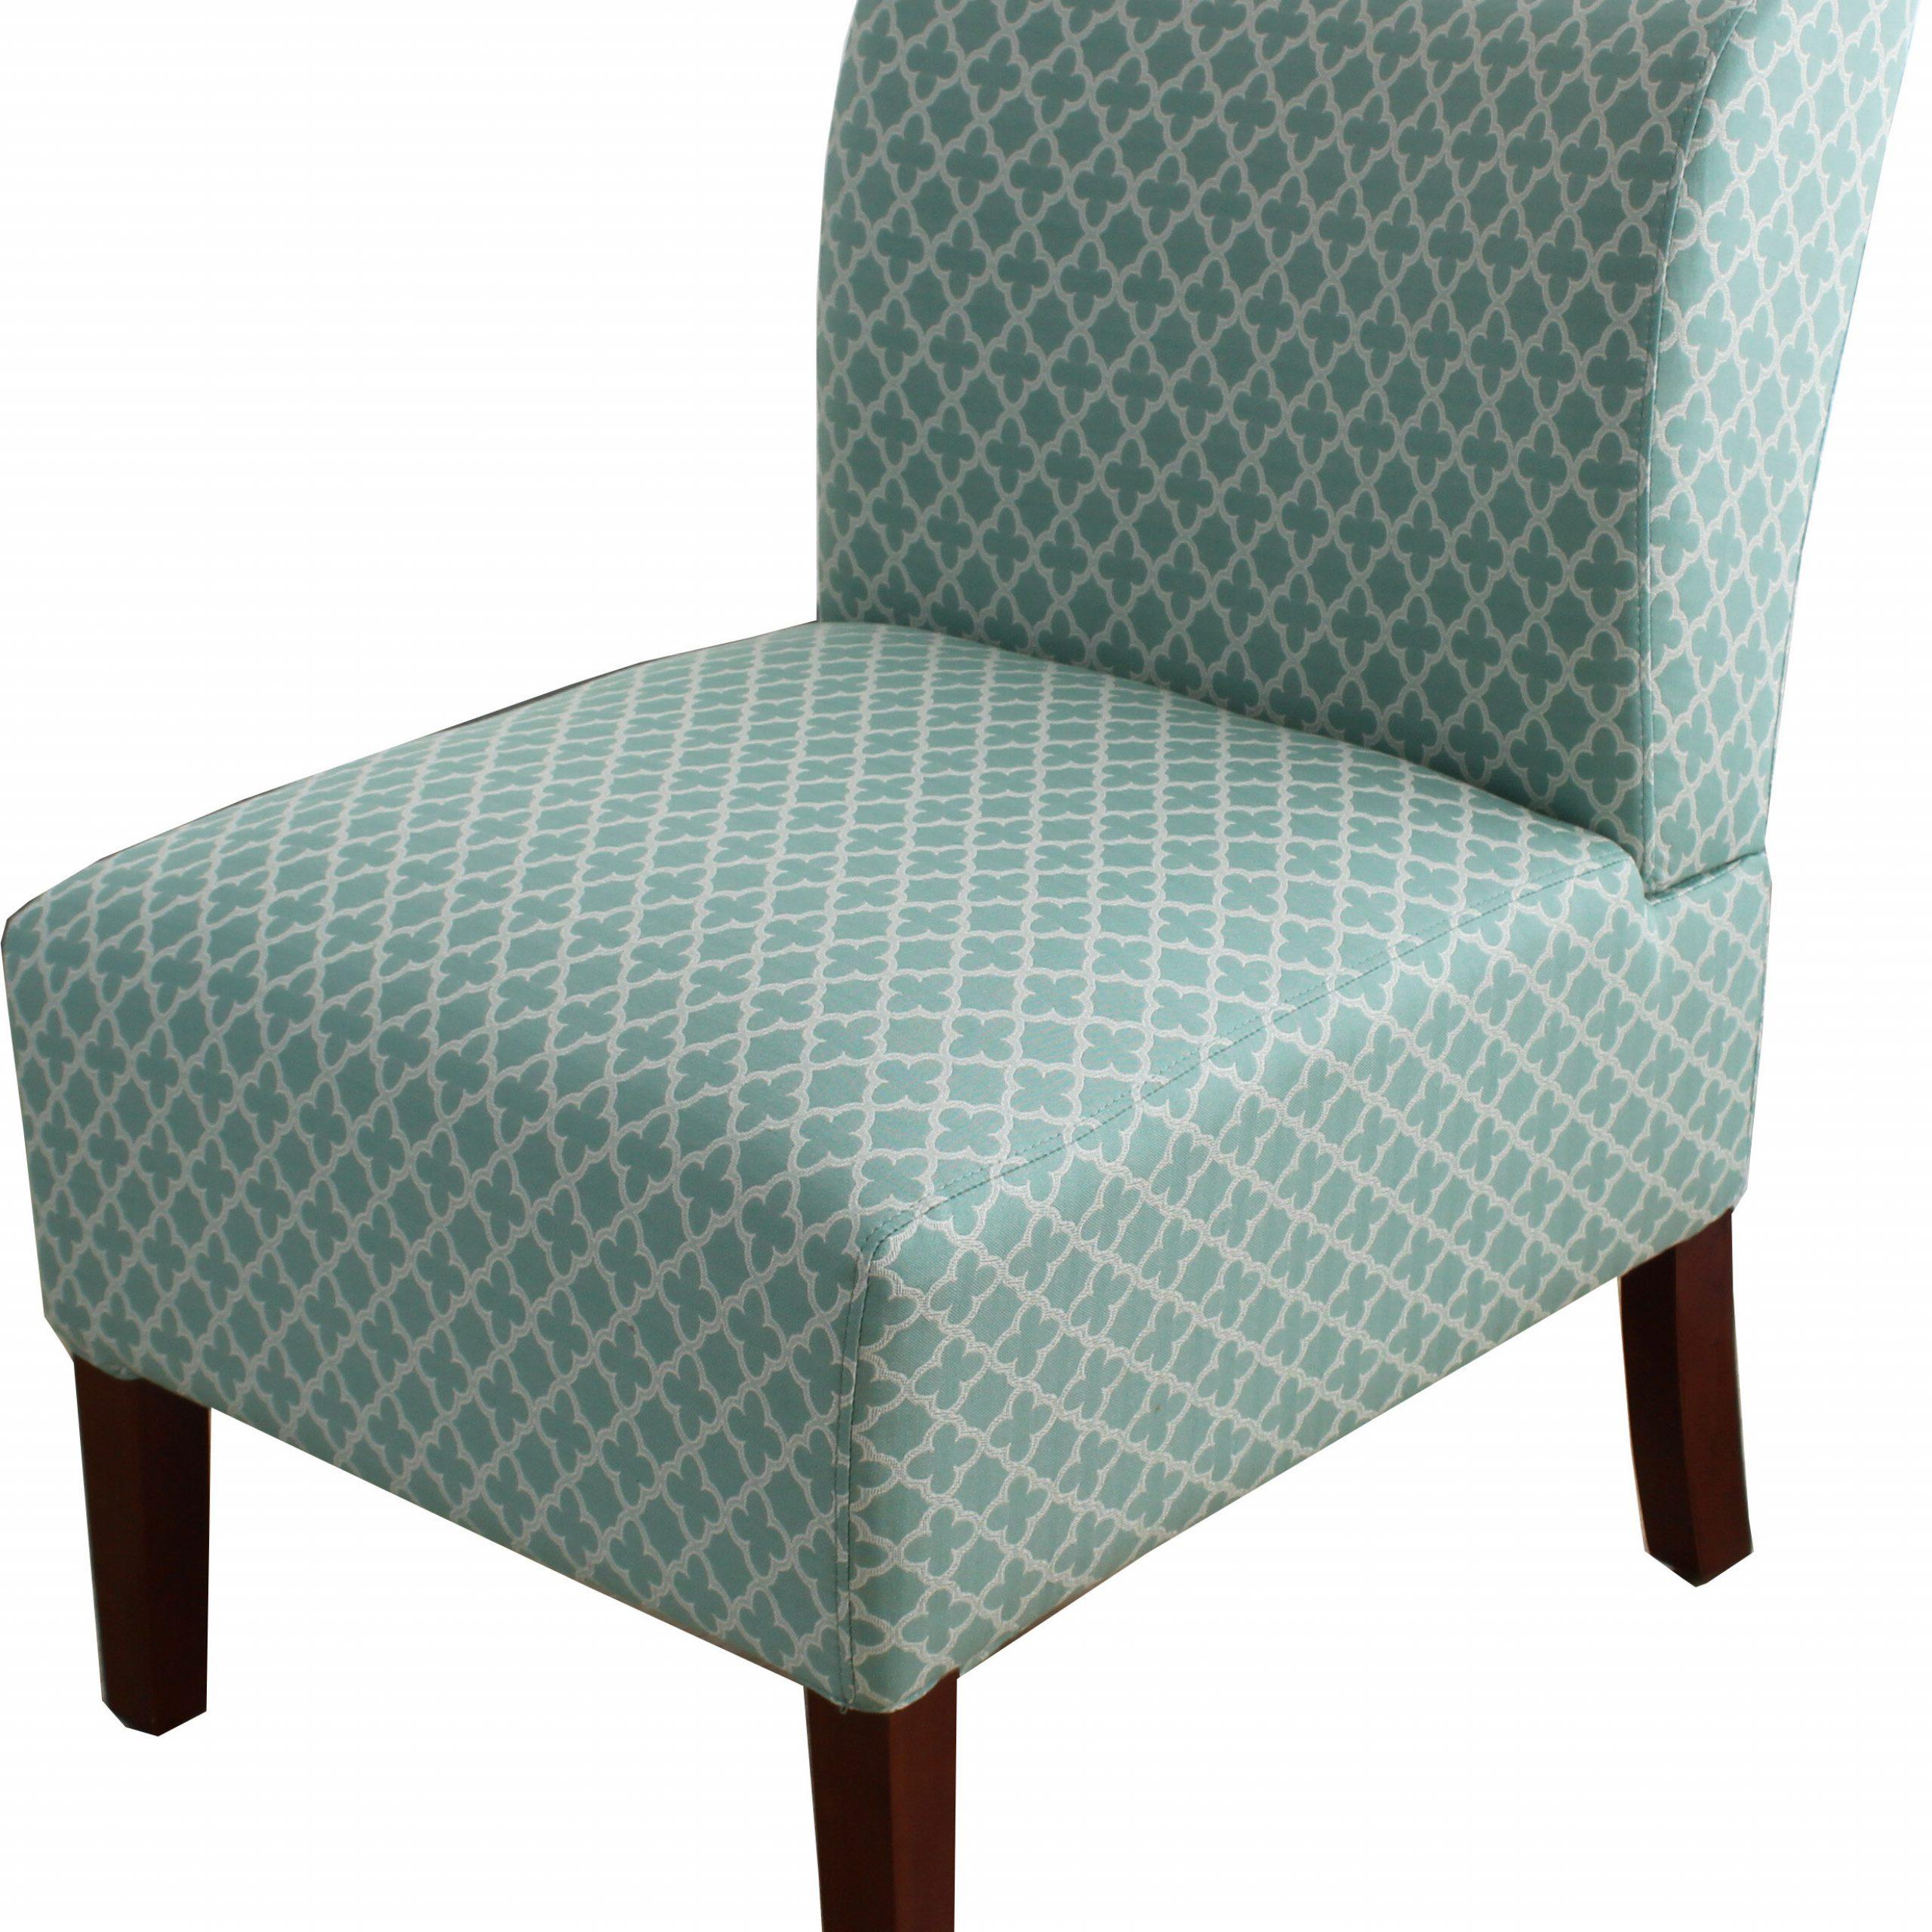 Preferred Maturin Slipper Chair In Gozzoli Slipper Chairs (View 2 of 20)